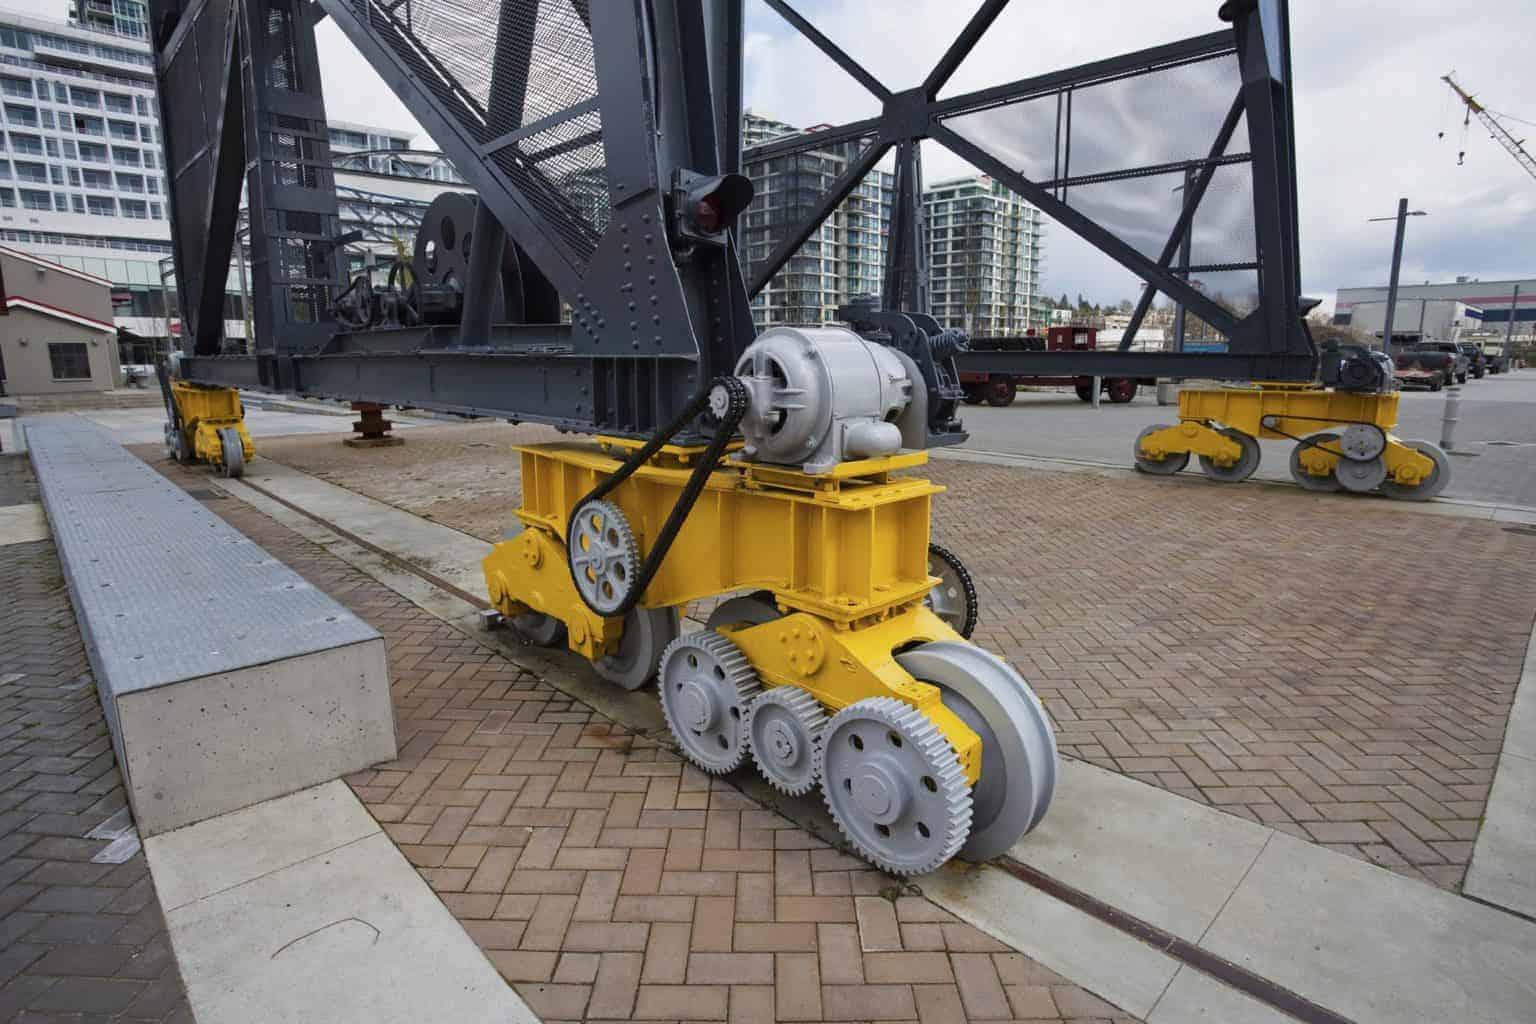 Jib Crane Wheels : Gantry crane brakes and accessories i industrial brake